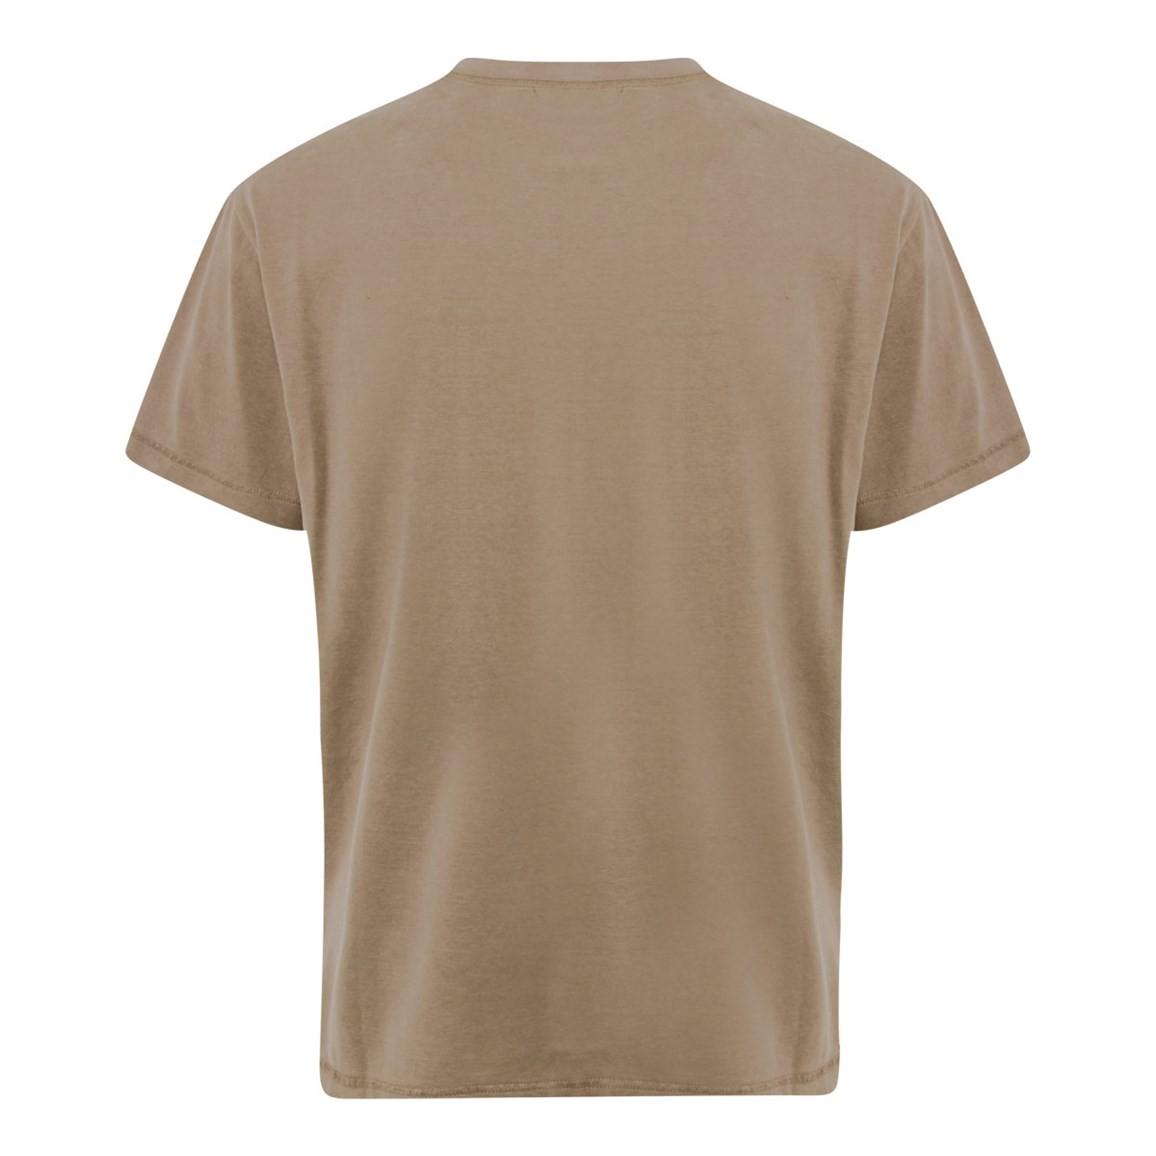 Seafarer supplies graphic print t shirt mushroom for T shirt printing supplies wholesale